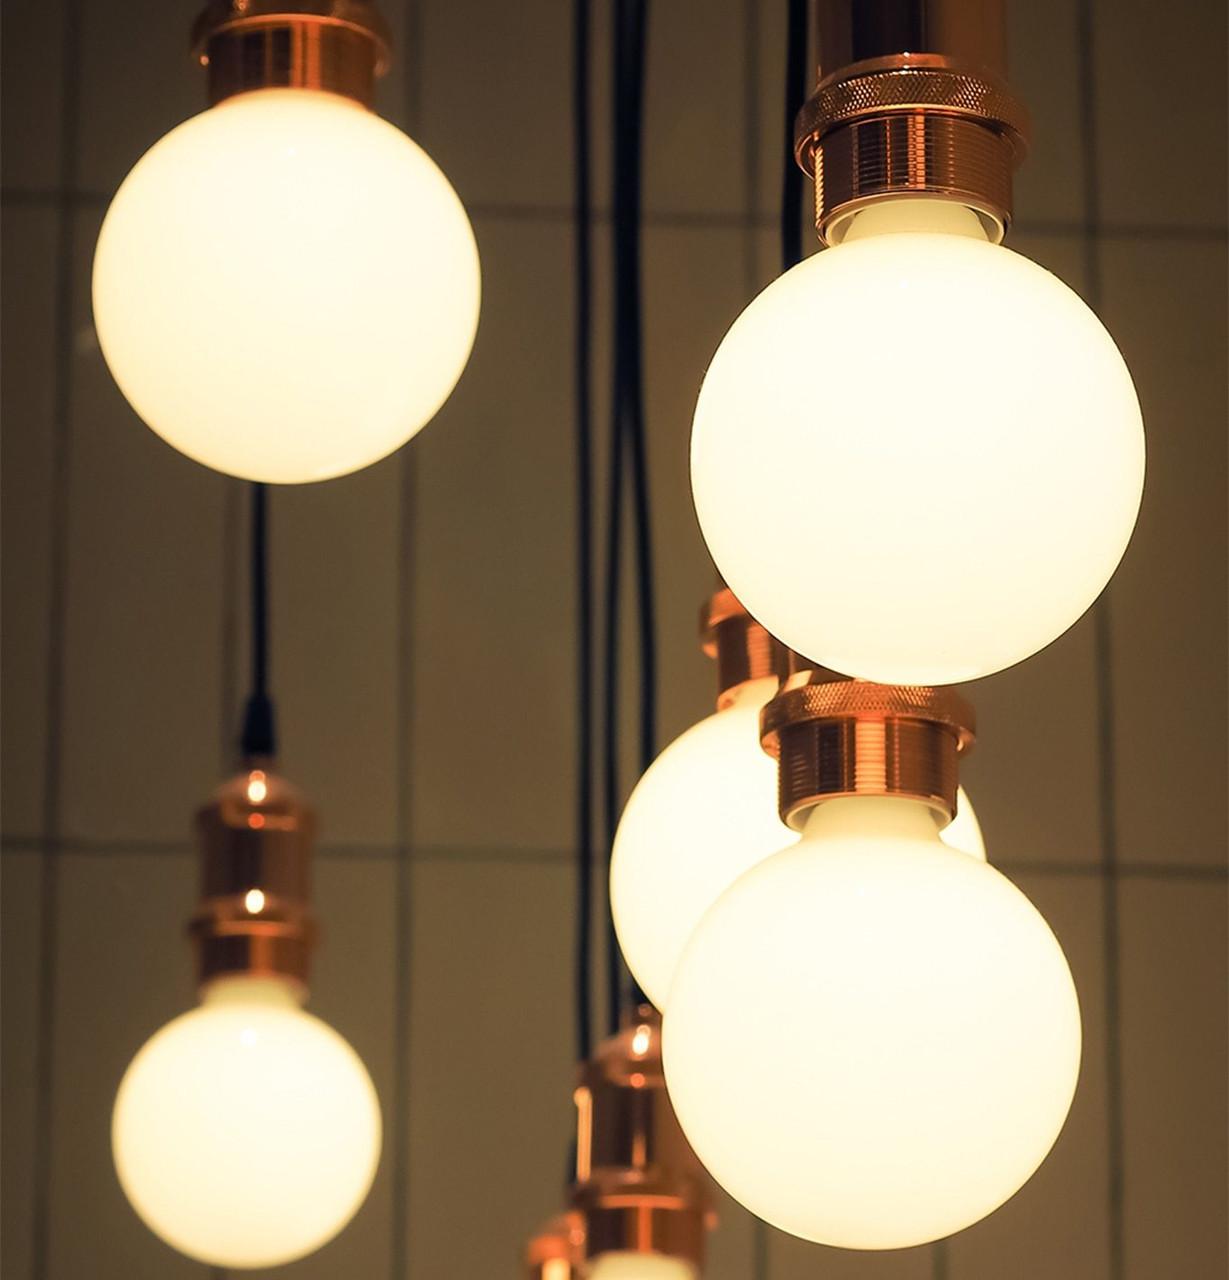 LED G125 E27 Light Bulbs